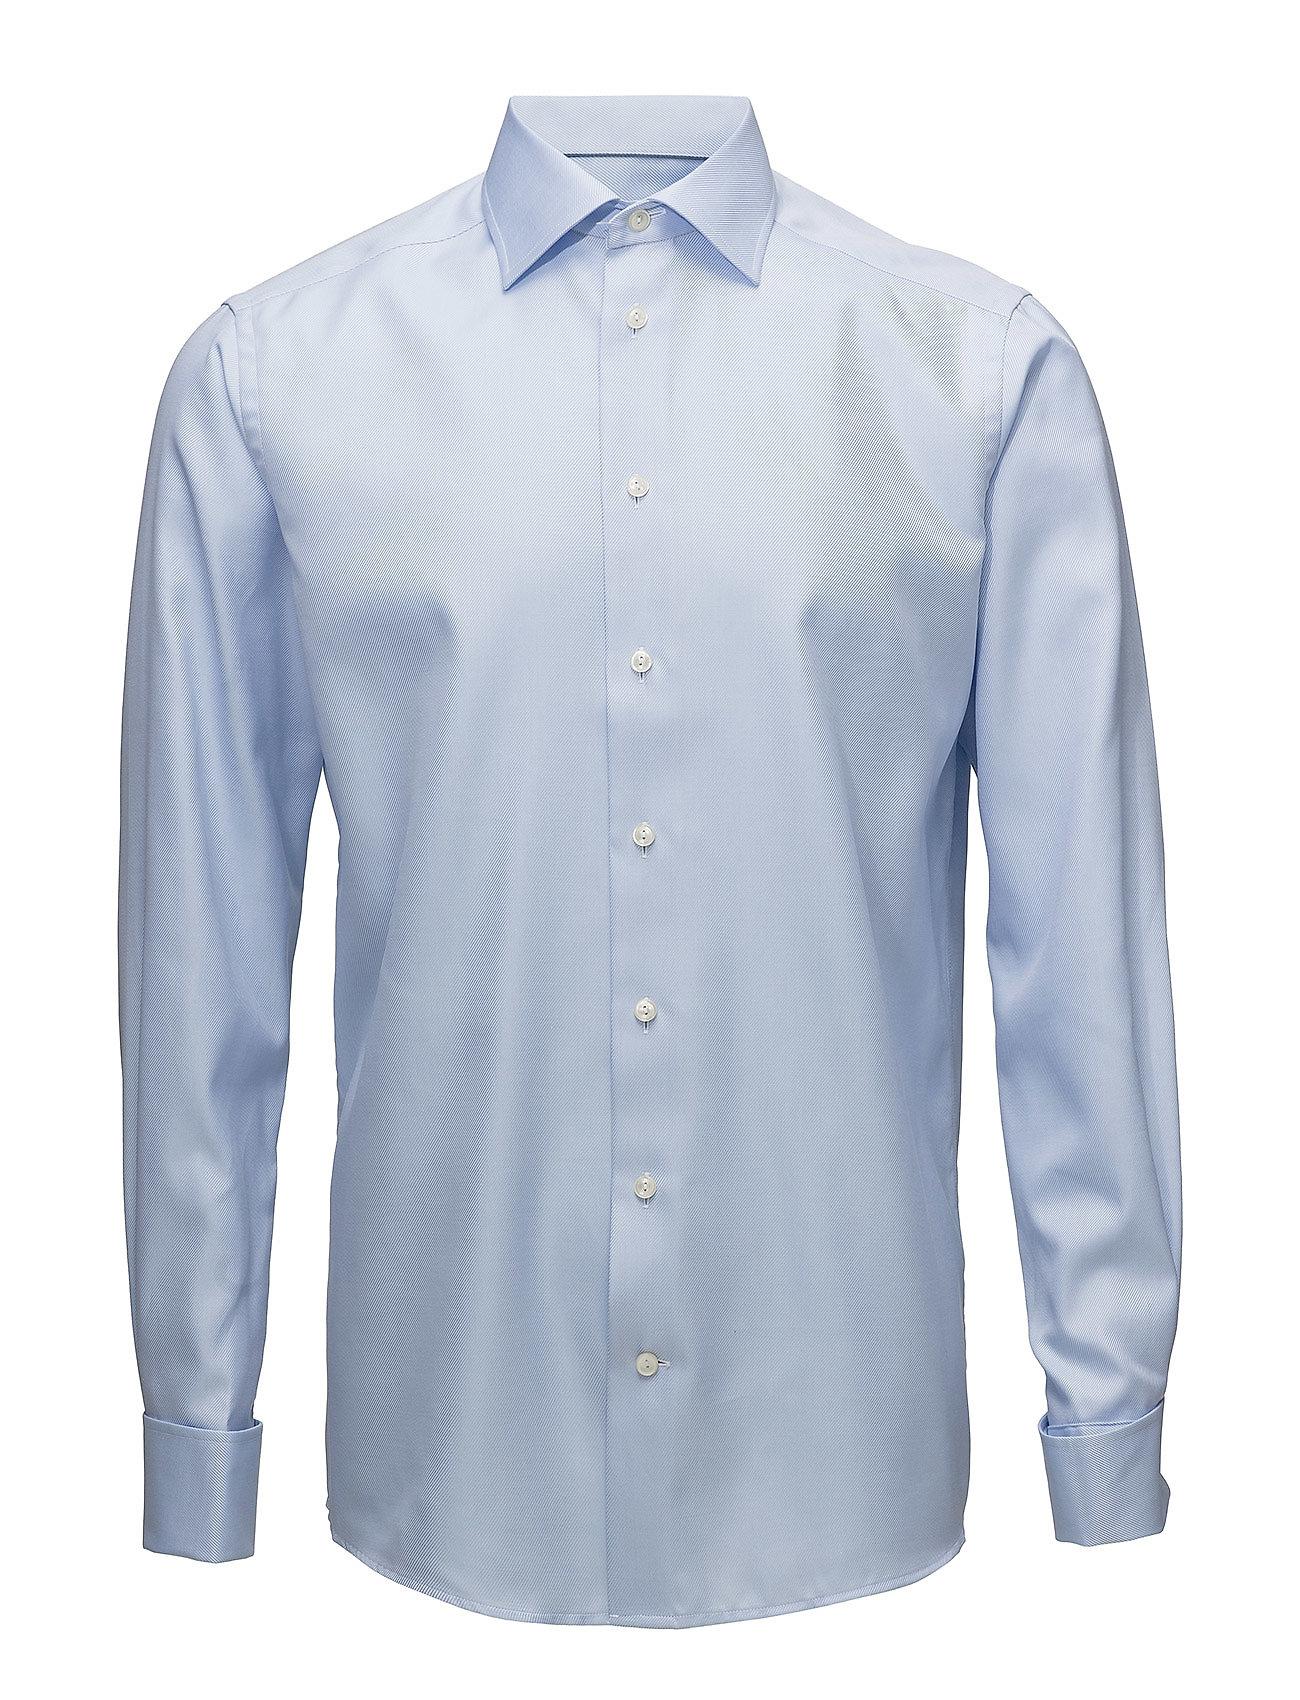 Eton Textured Twill-Contemporary - BLUE